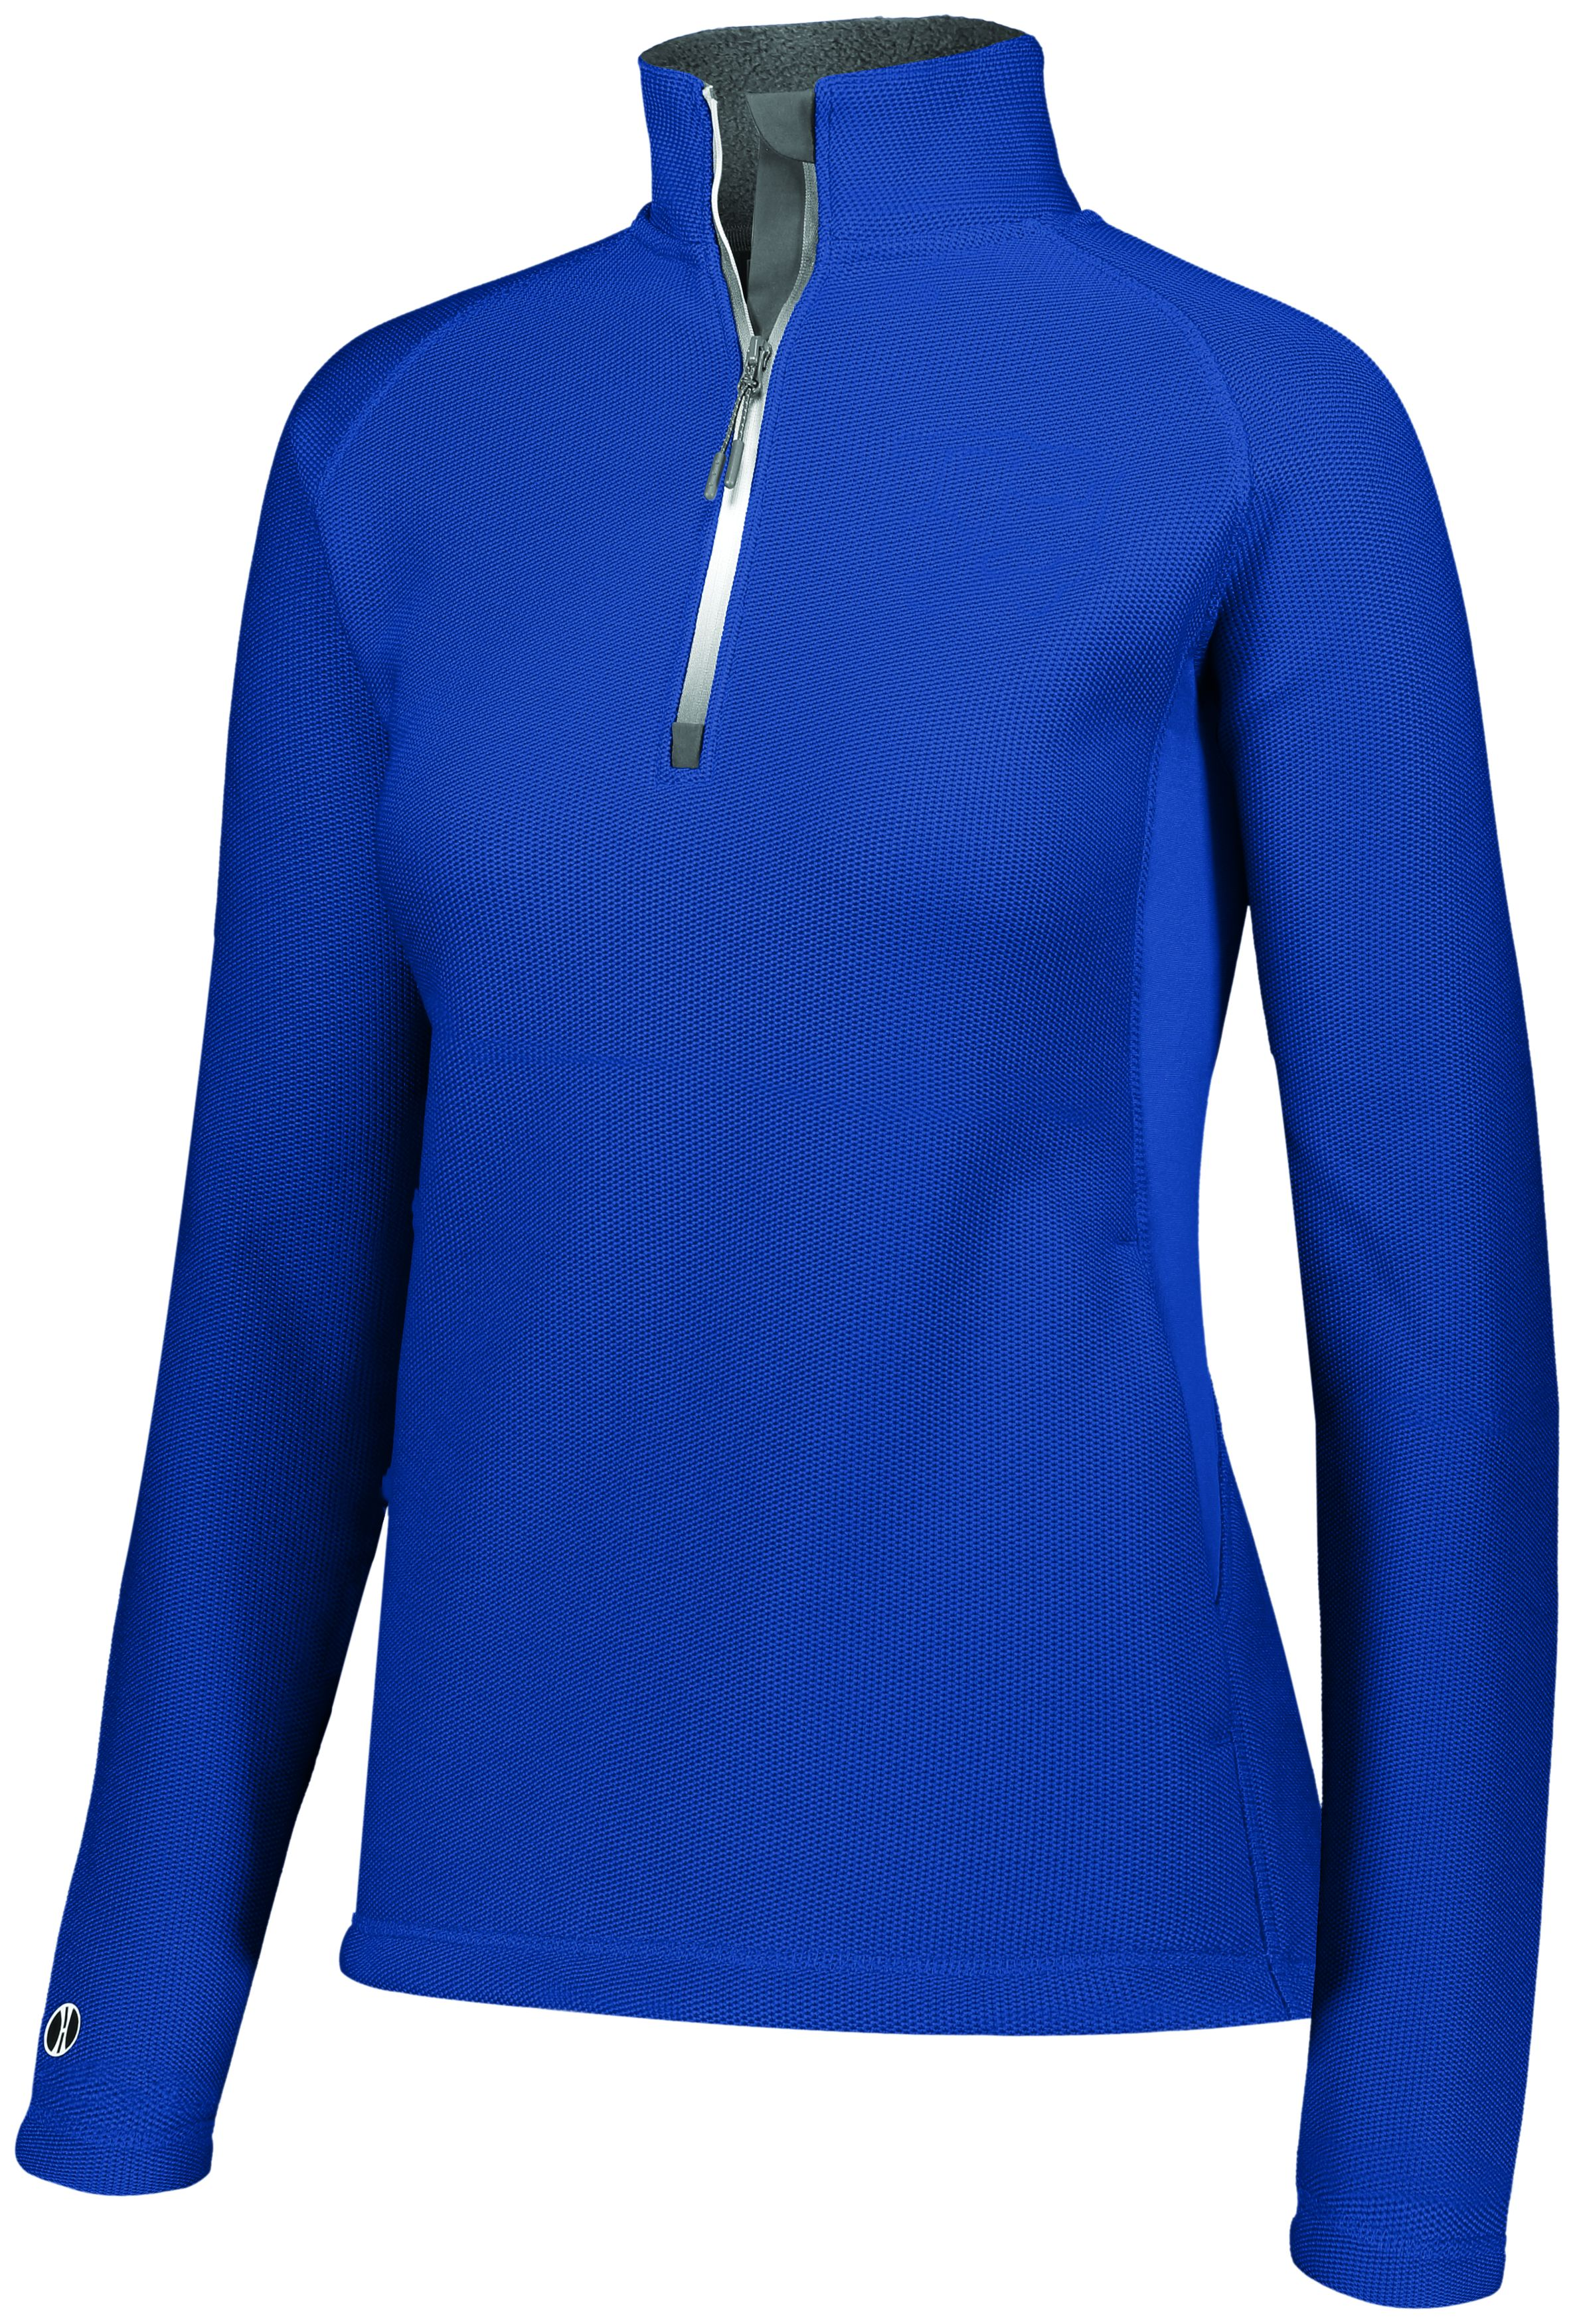 Ladies Invert 1/2 Zip Pullover - ROYAL